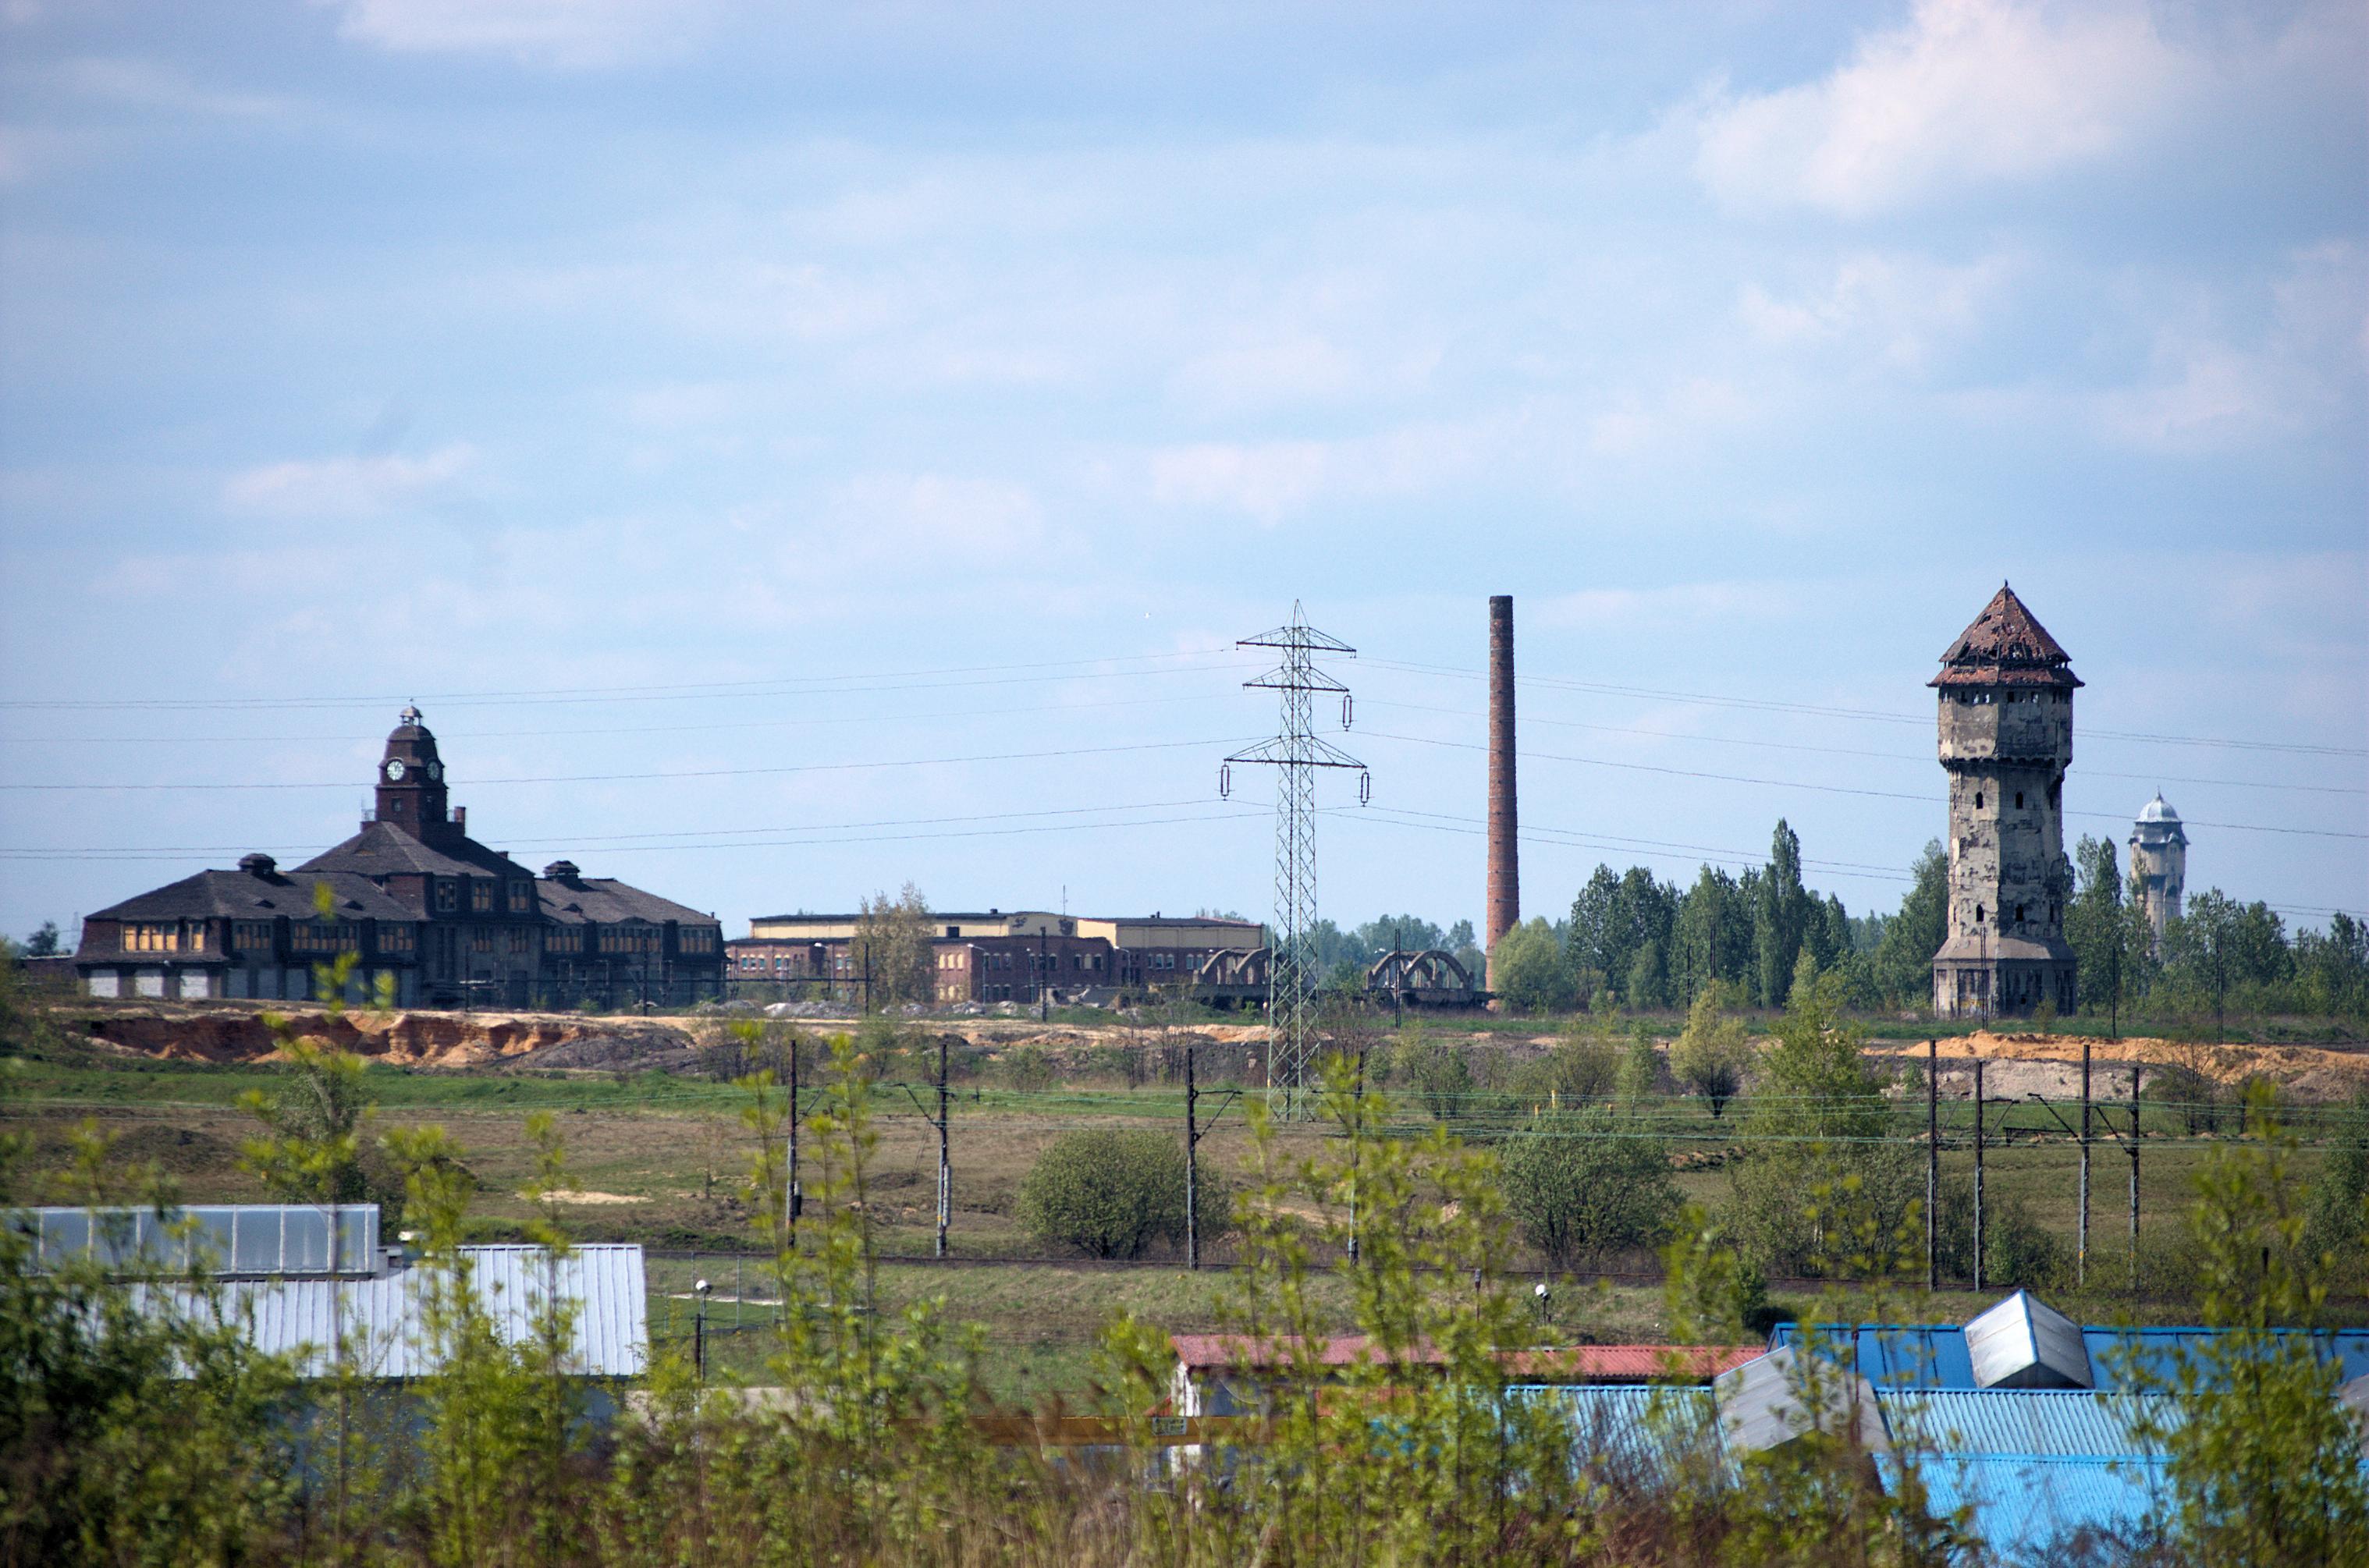 File:POL Katowice Huta Uthemann jpg - Wikimedia Commons